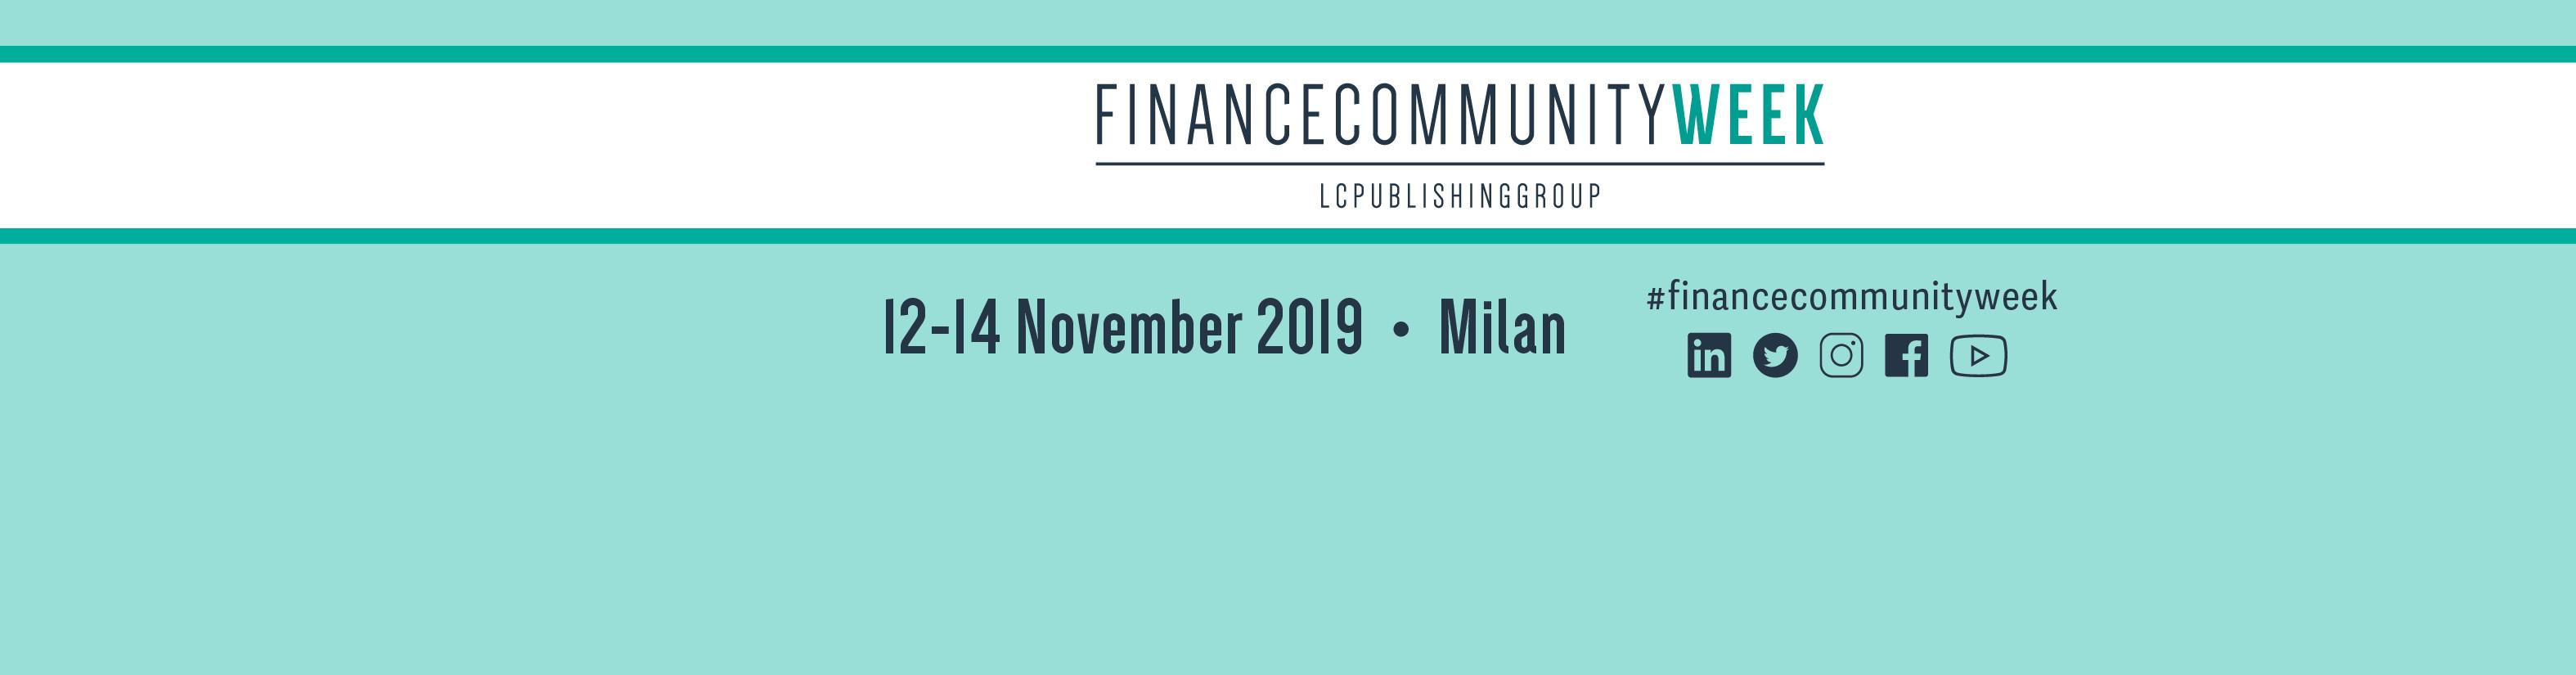 Financecommunity Week, 12-14 November 2019, Milan